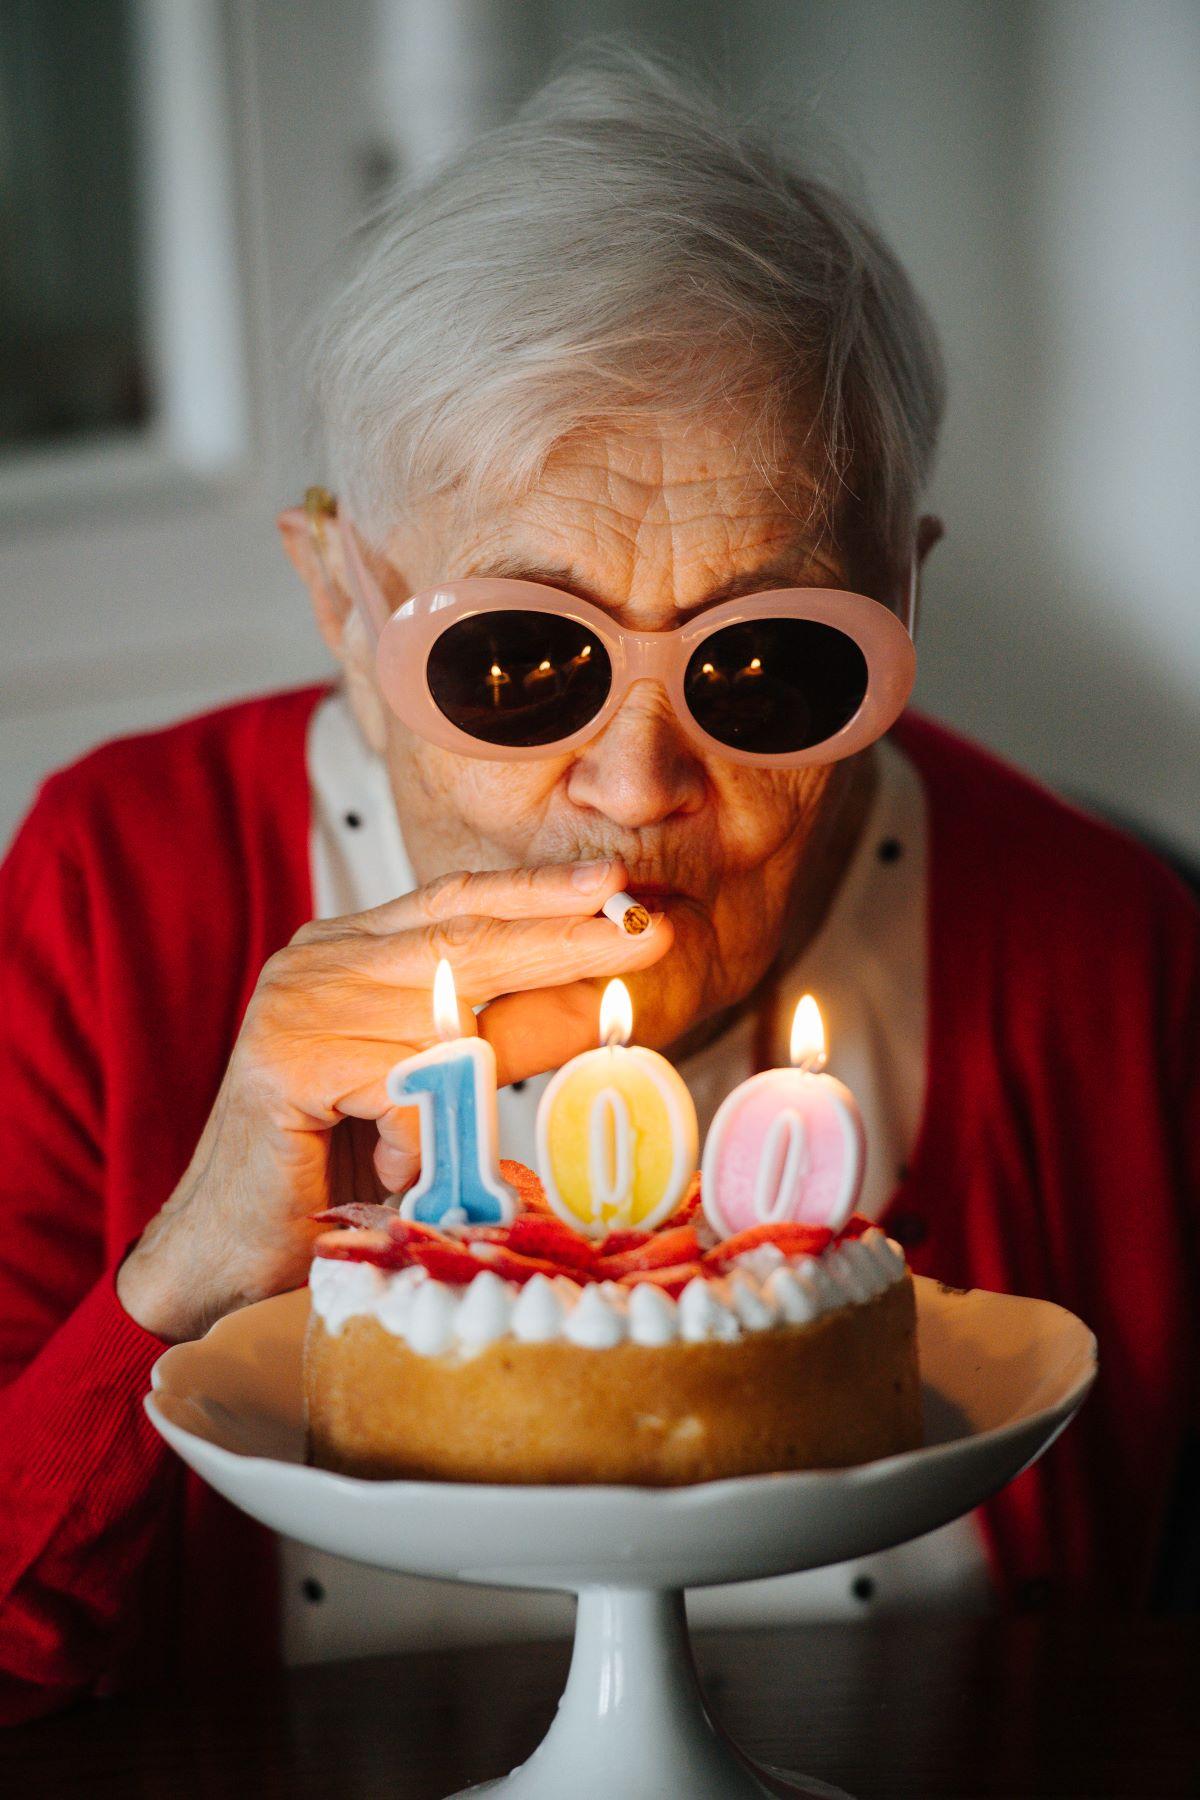 Birthday Gift Guide for Milestone Birthdays, 100